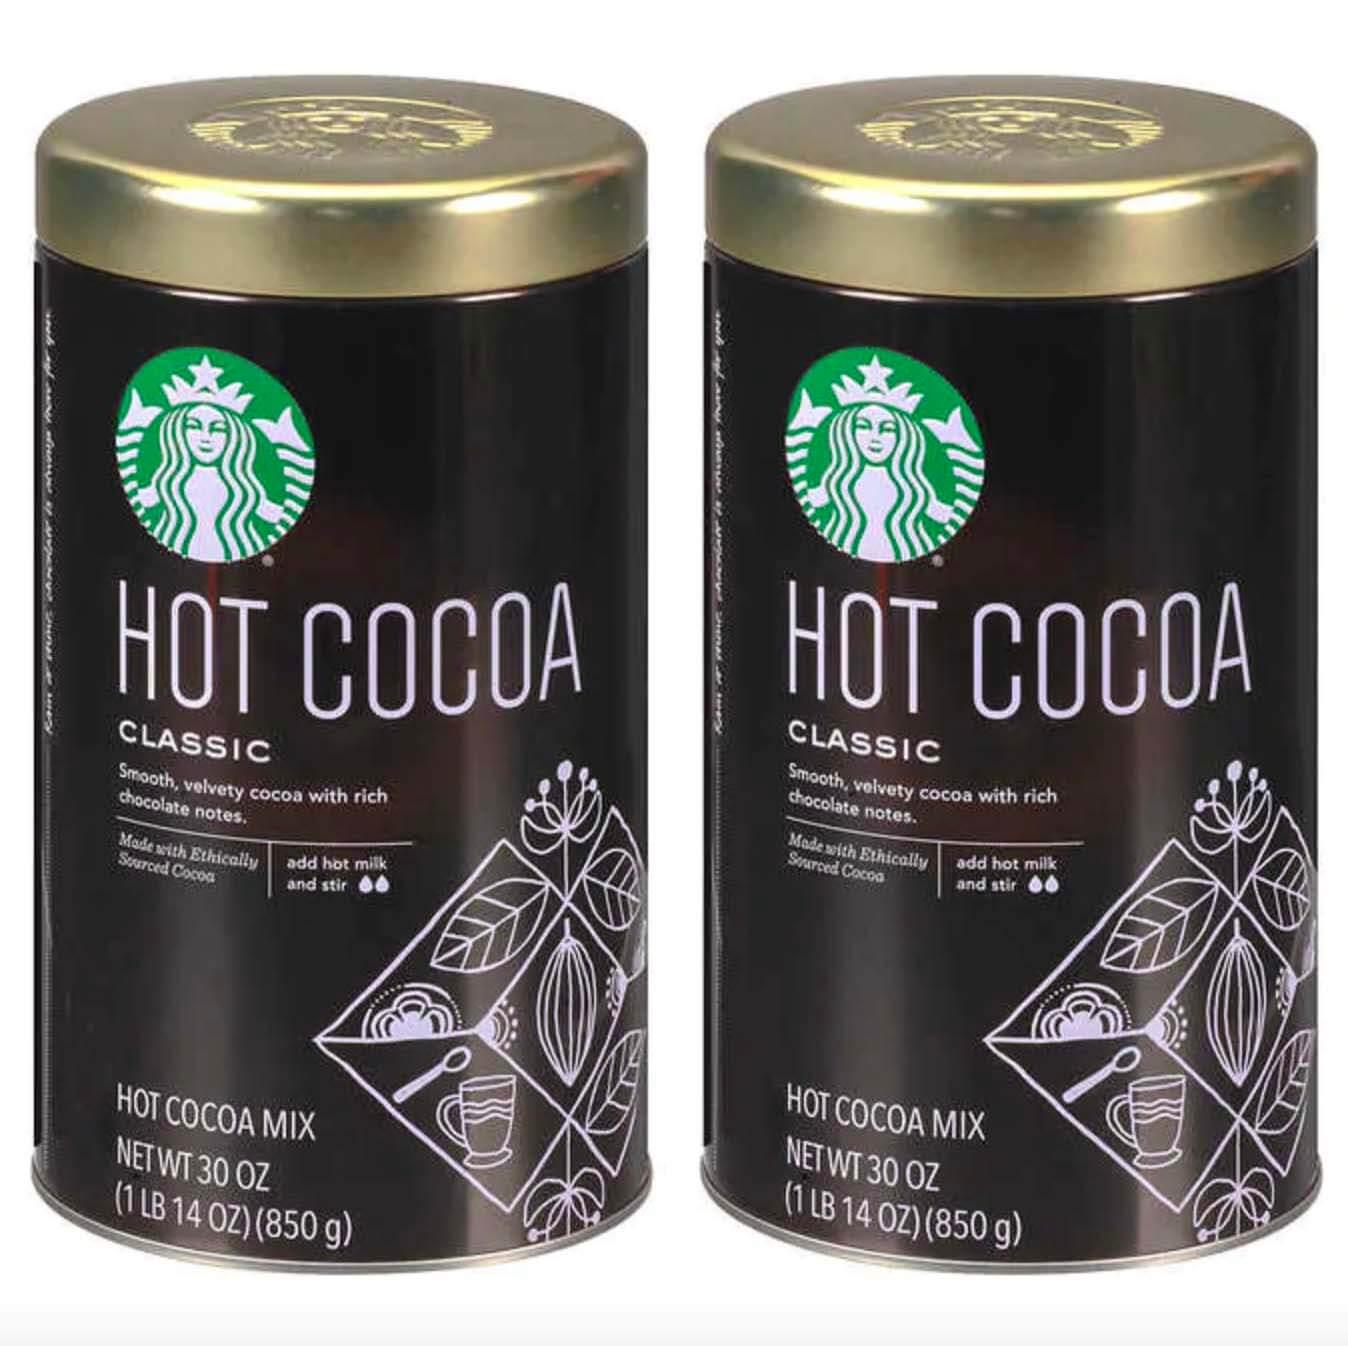 Starbucks Hot Cocoa Mix